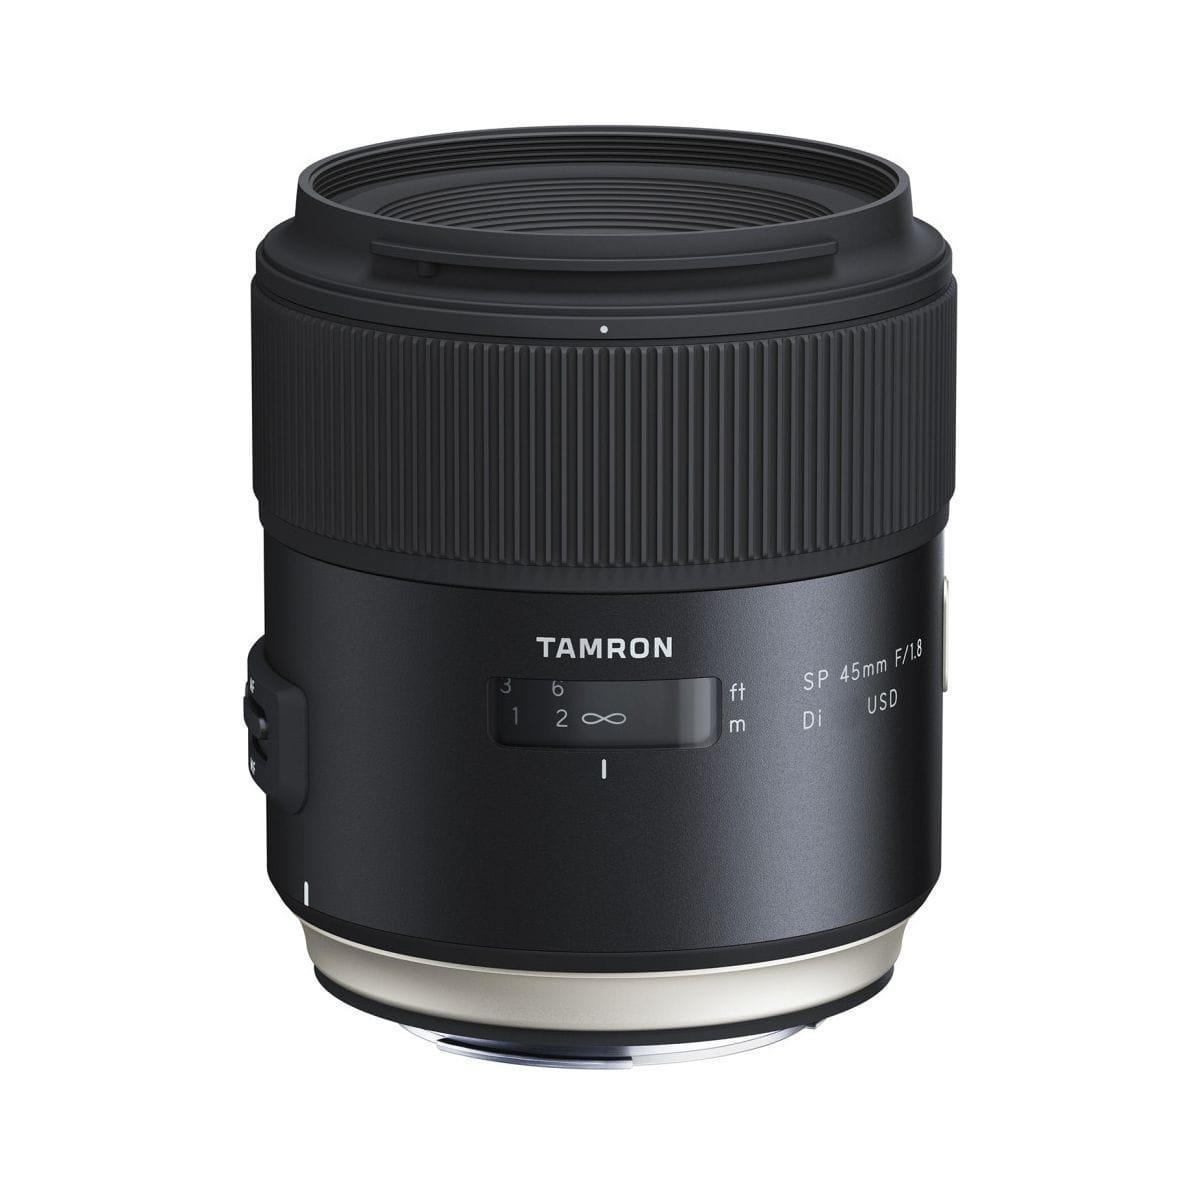 Objektív Tamron Canon EF, Nikon F (FX), Sony/Minolta Alpha 45mm 1.8